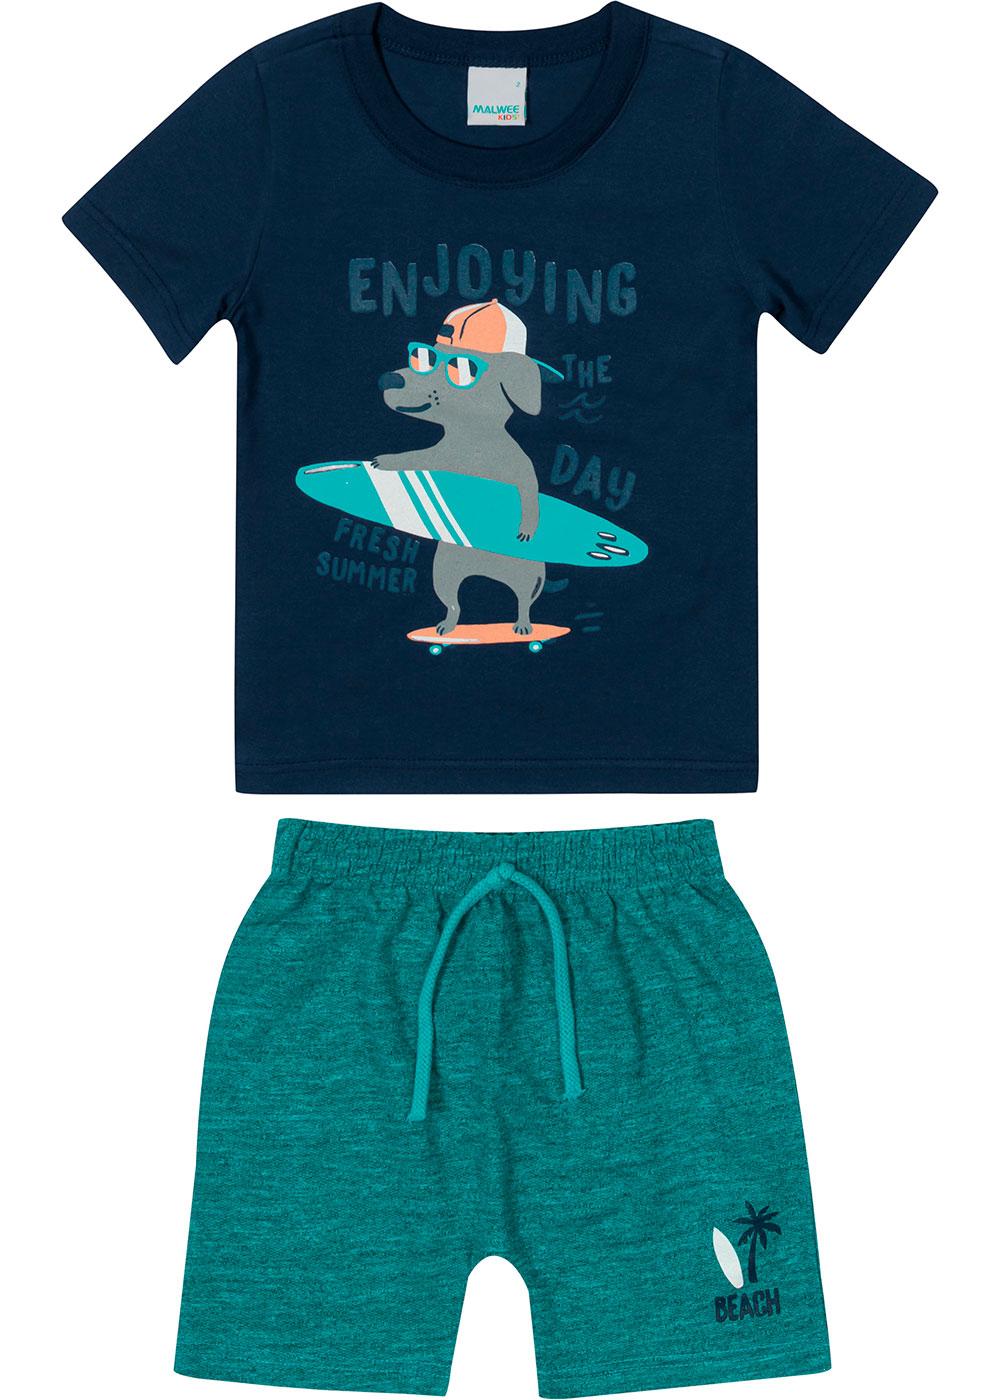 Conjunto Infantil Masculino Verão Azul Enjoying - Malwee